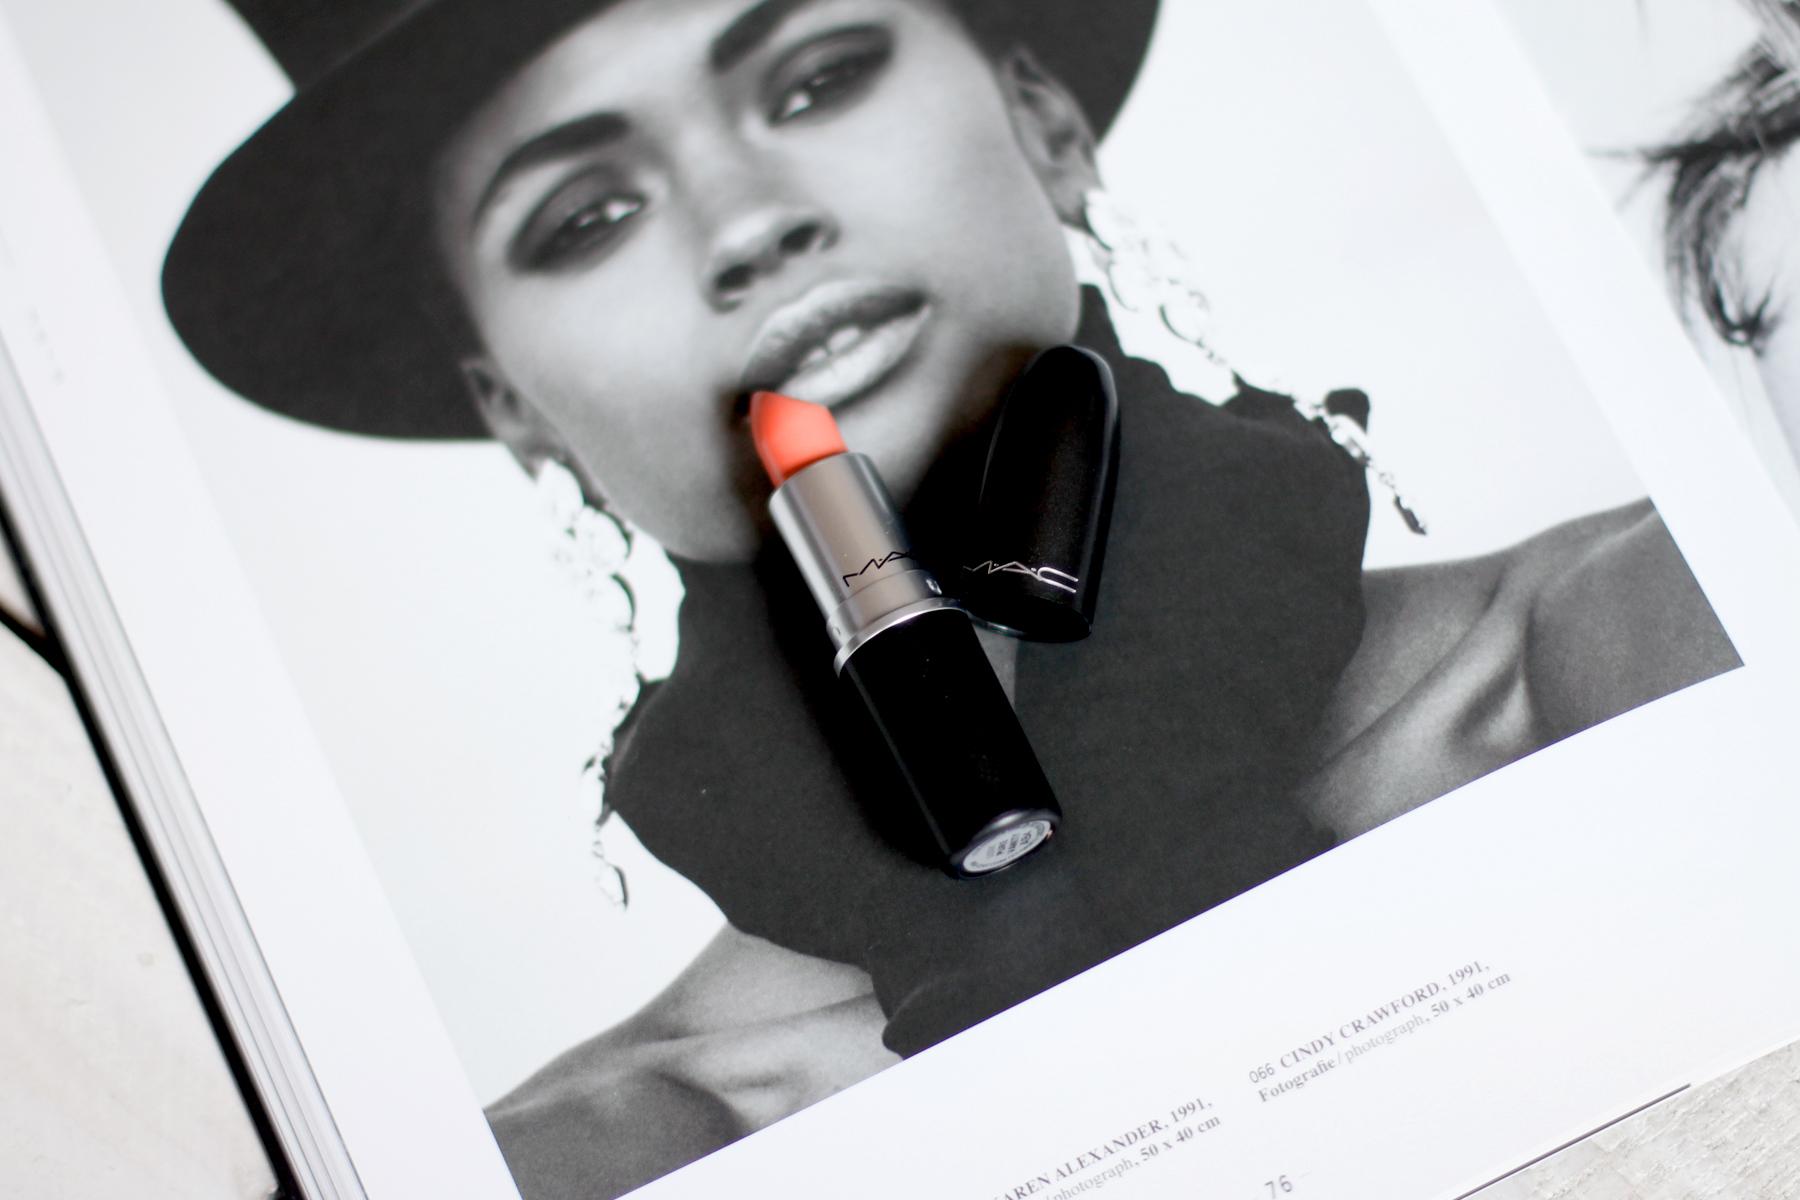 nude look beauty favorites summer 2015 shiseido l'oreal m.a.c. douglas beautyblogger ricarda schernus düsseldorf berlin 2